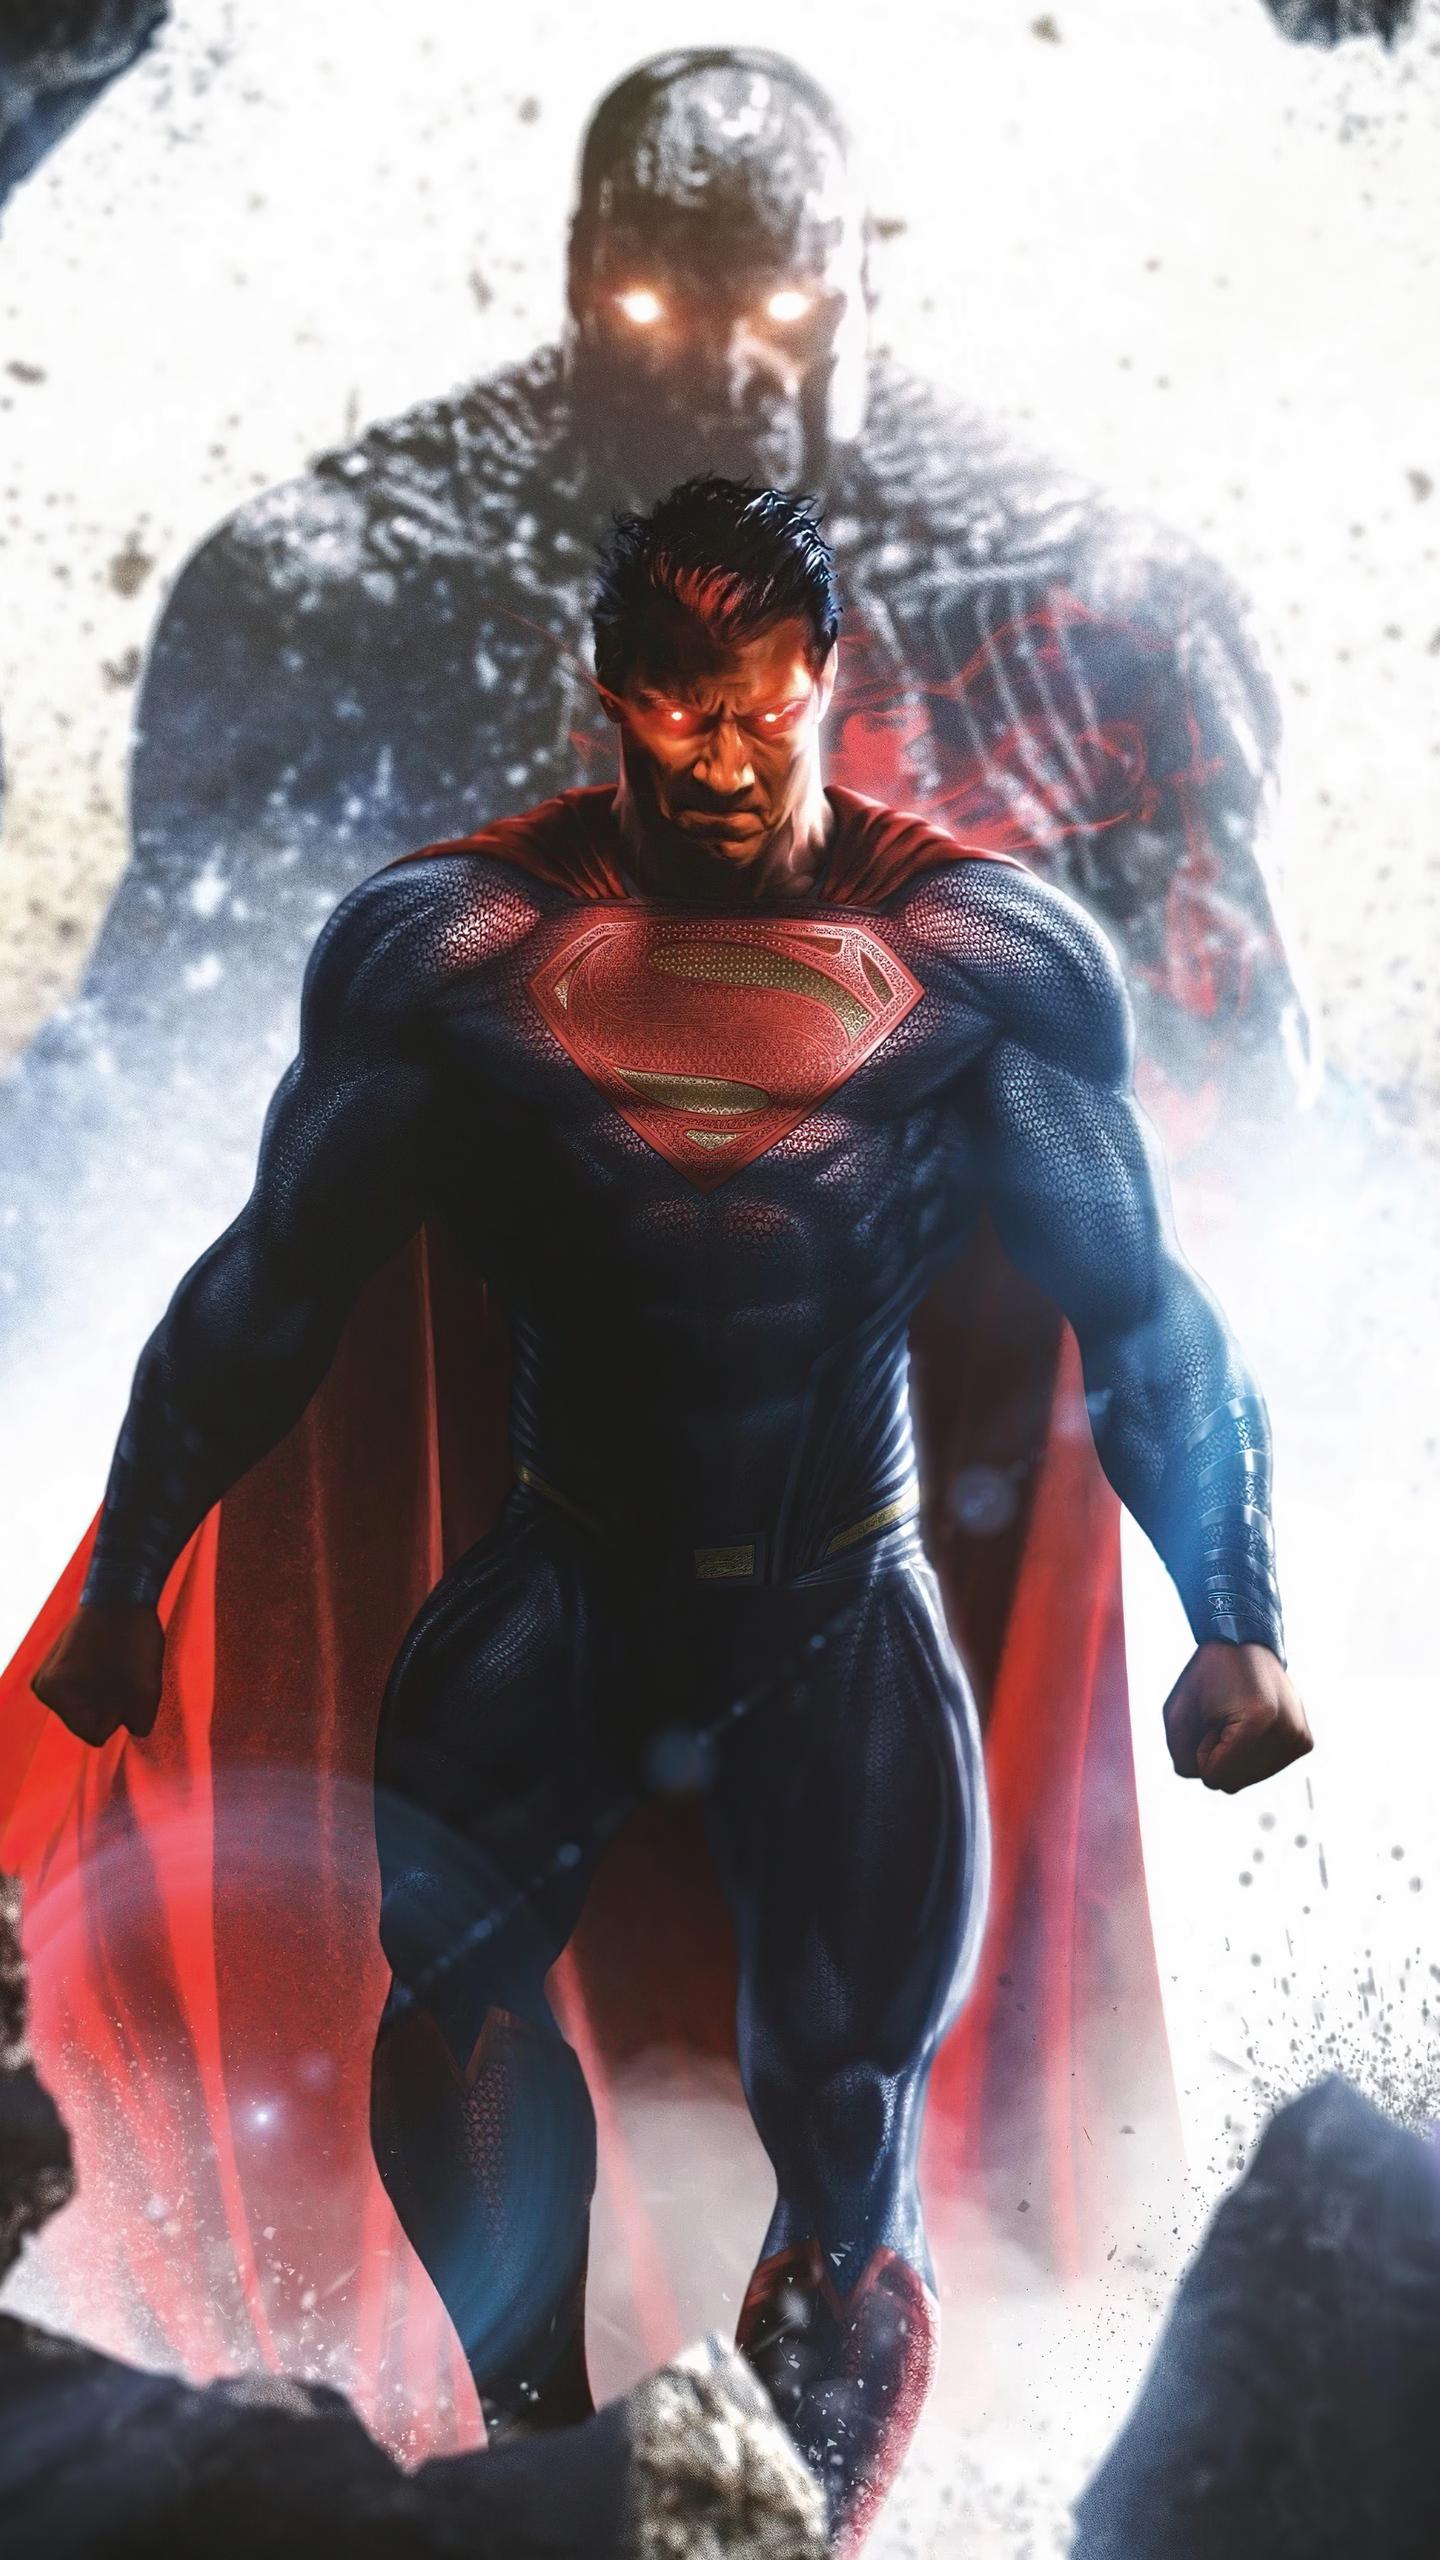 superman-nightmare-5k-3x.jpg